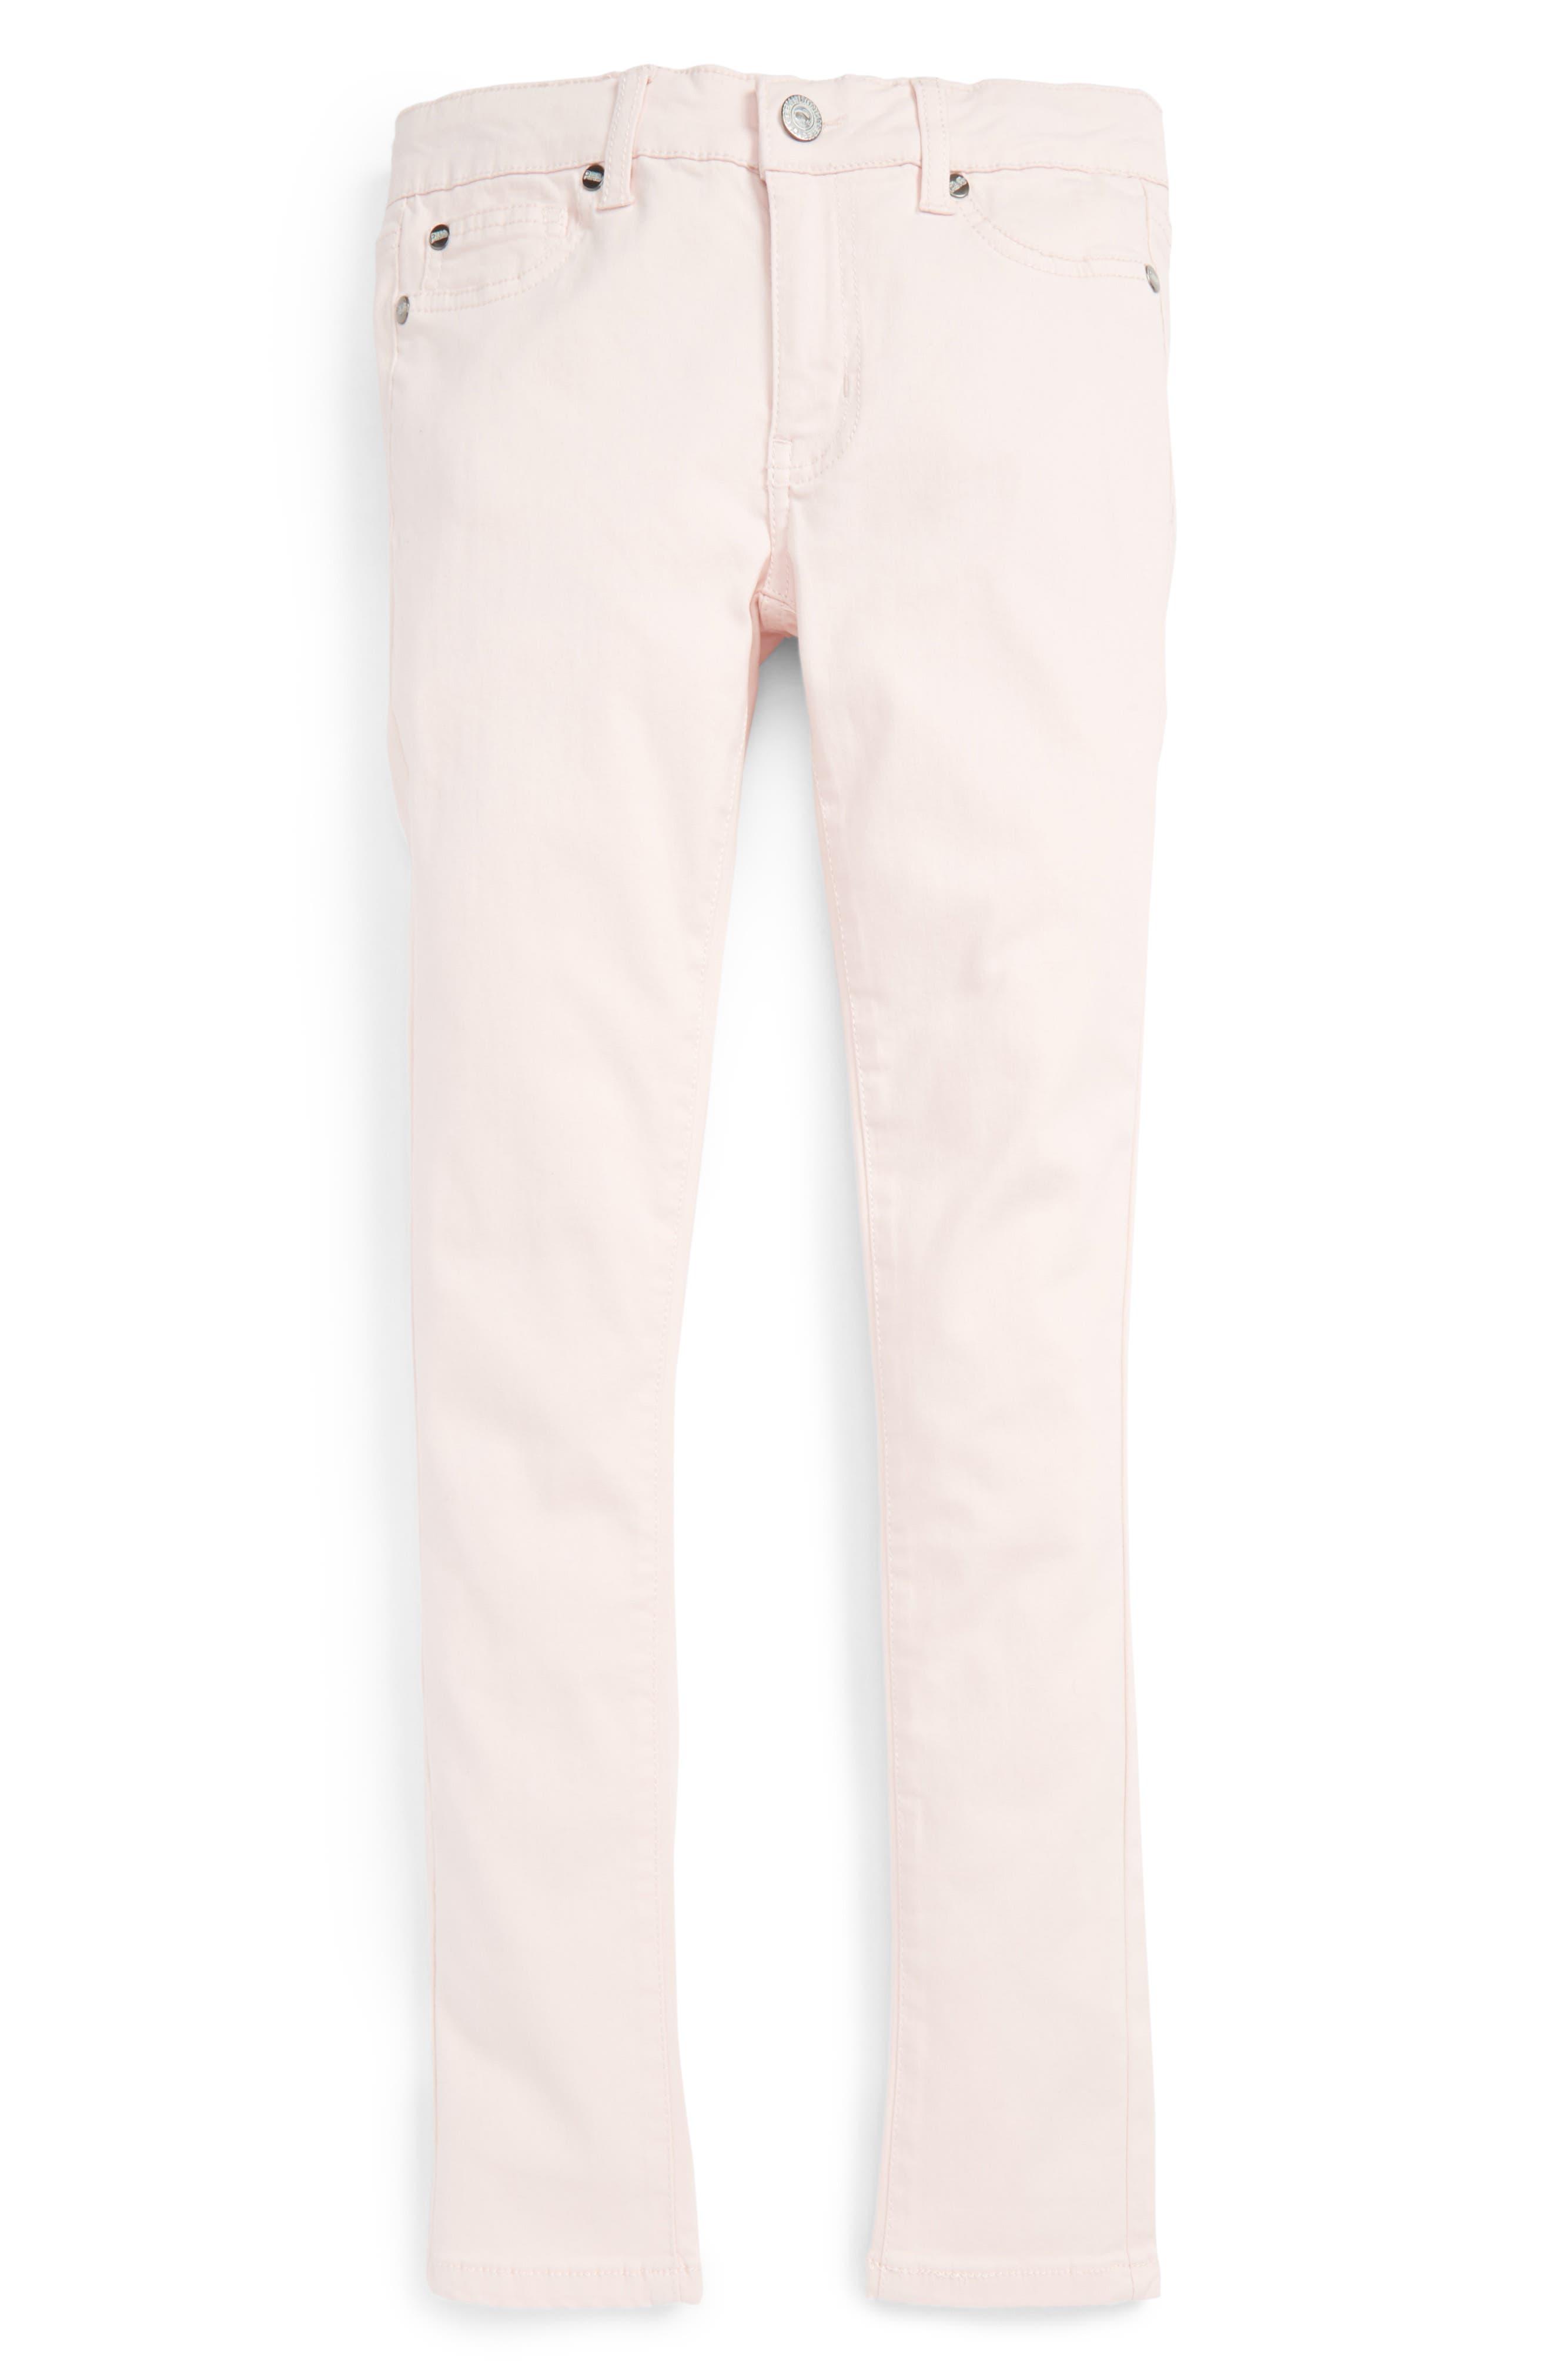 Taylor Skinny Jeans,                             Main thumbnail 1, color,                             682